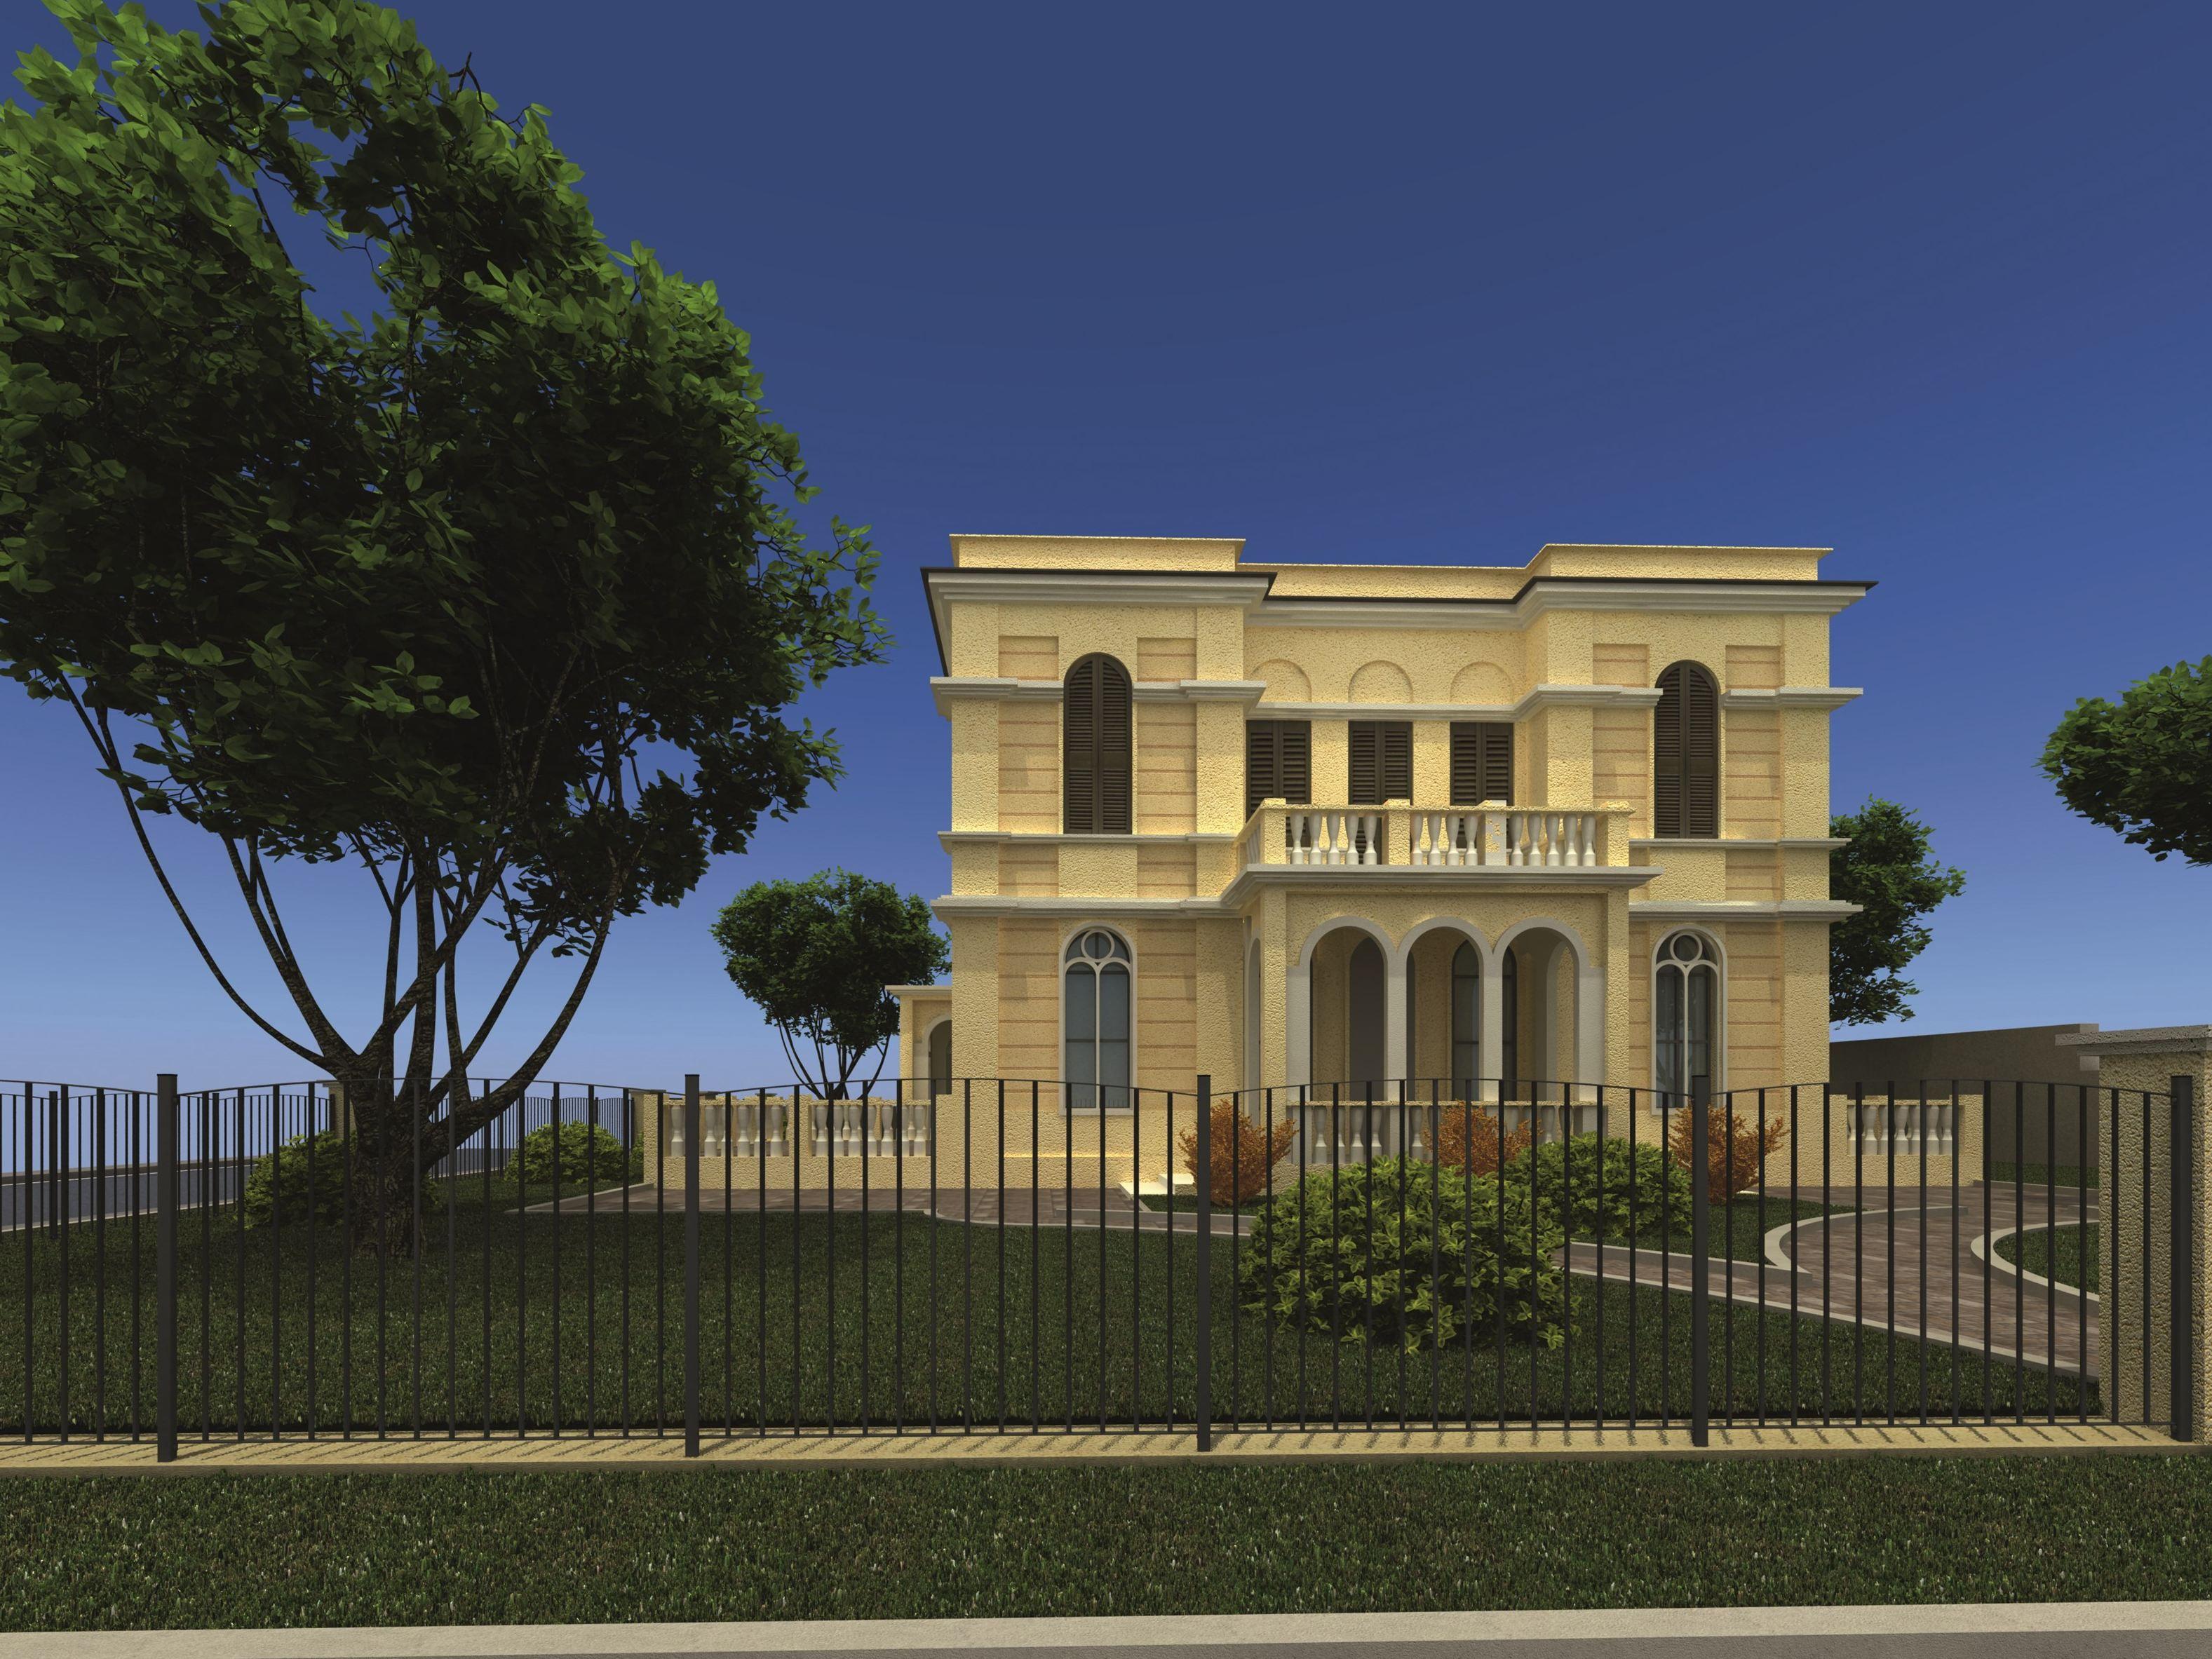 palladio recinzione by betafence italia. Black Bedroom Furniture Sets. Home Design Ideas